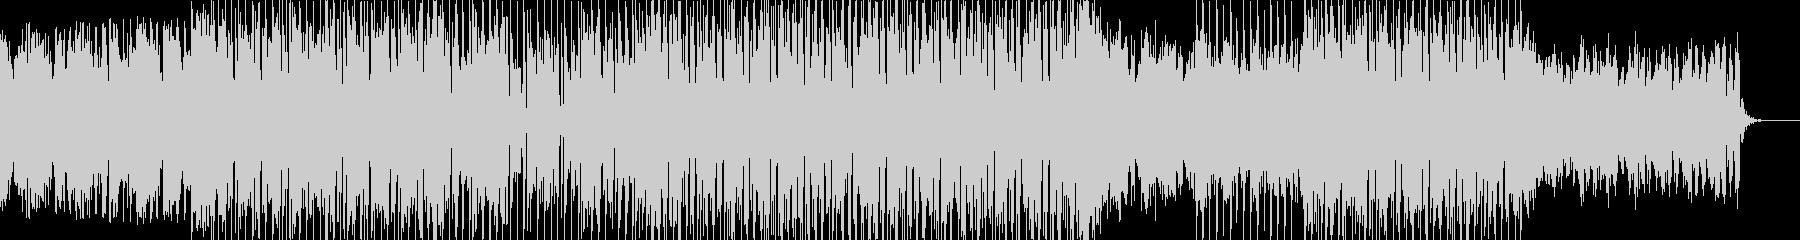 Lo-fi Technoの未再生の波形